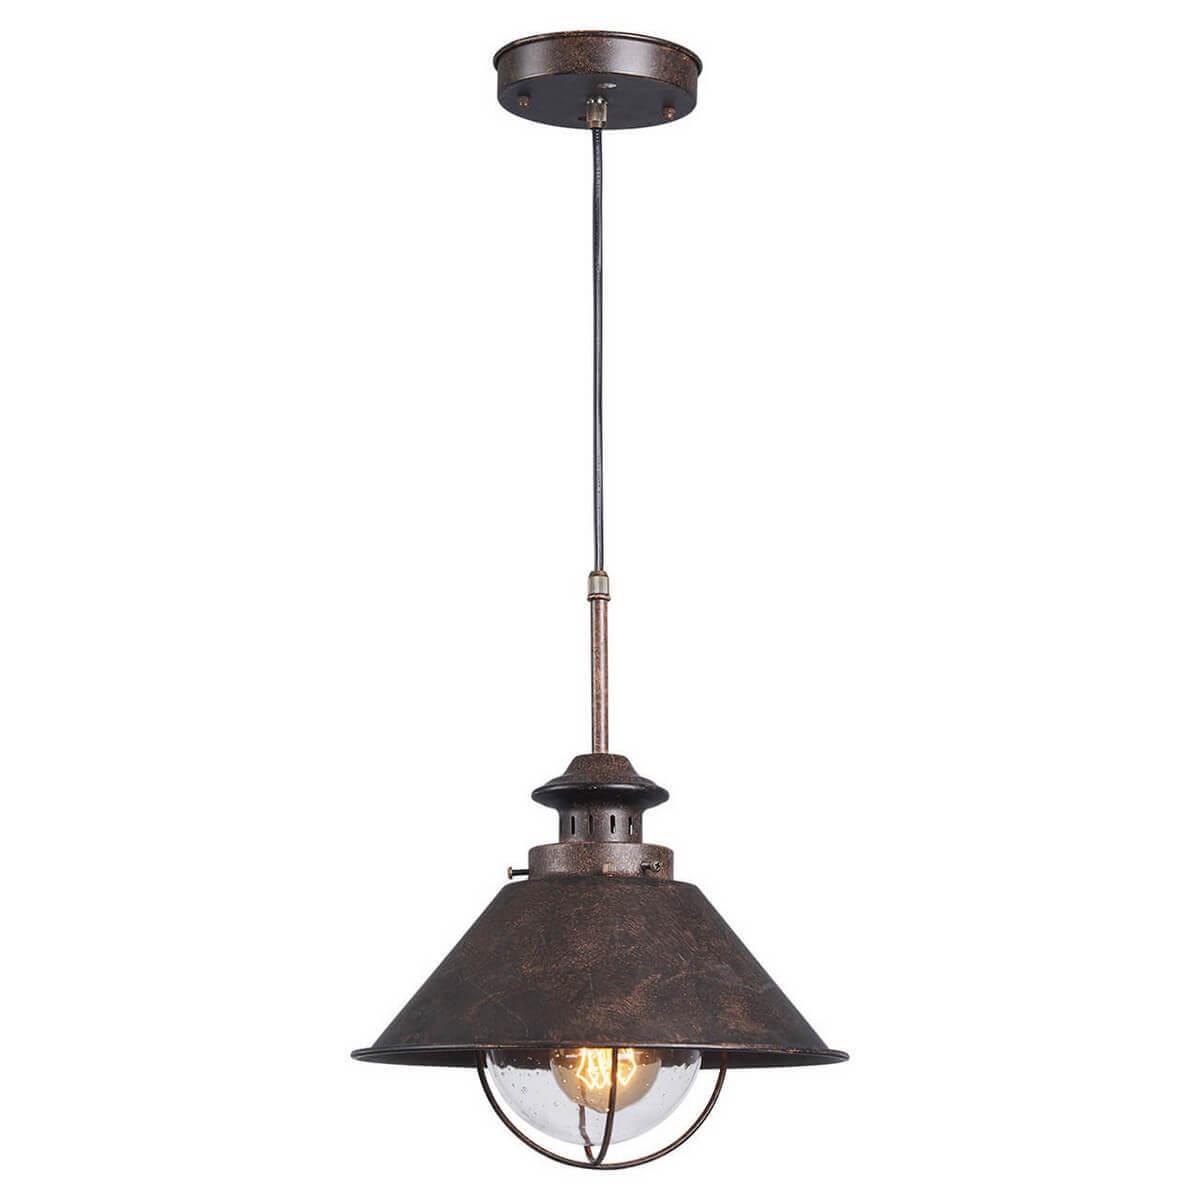 цена на Светильник Lussole LOFT LSP-9833 LSP-9833